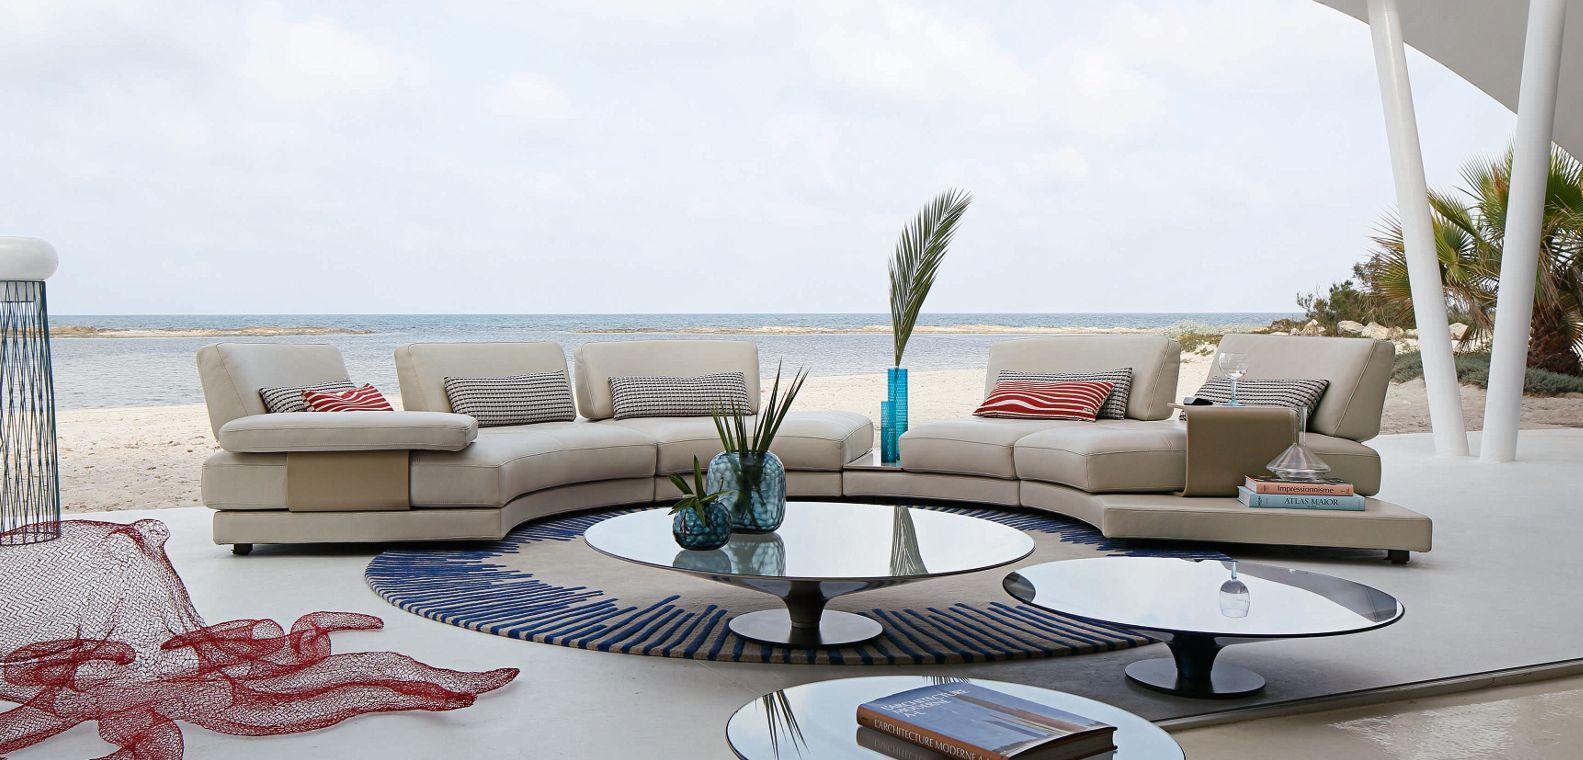 Beach Bay Canape By Roche Bobois Loft Decor Outdoor Furniture Sets Furniture